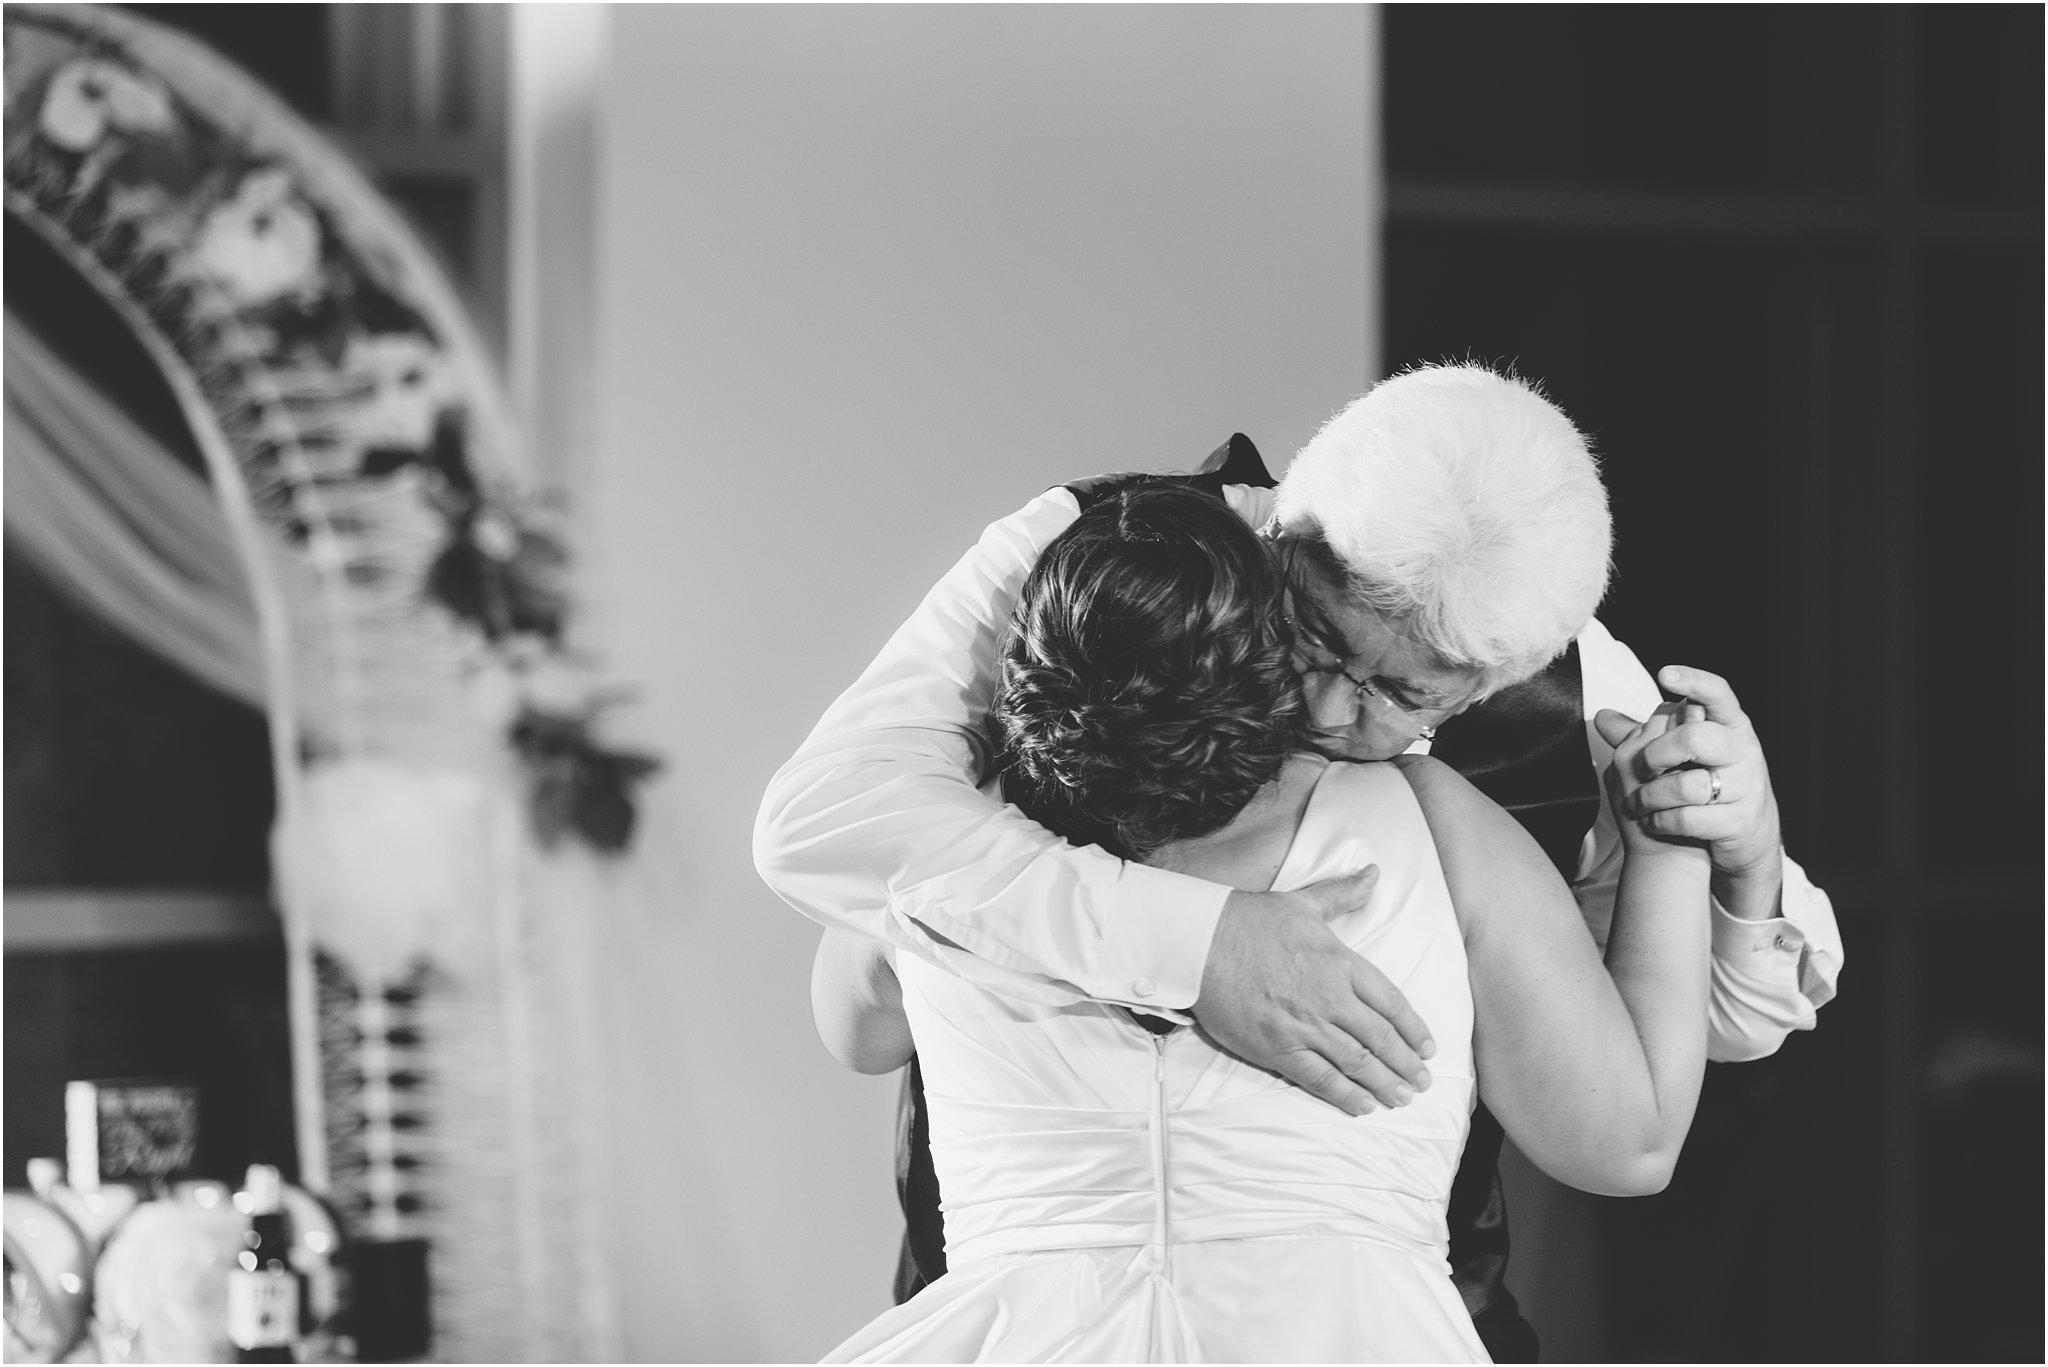 va_jessica_ryan_photography_virginia_wedding_norfolk_harrison_opera_house_norfolk_arts_district_portraits_3848